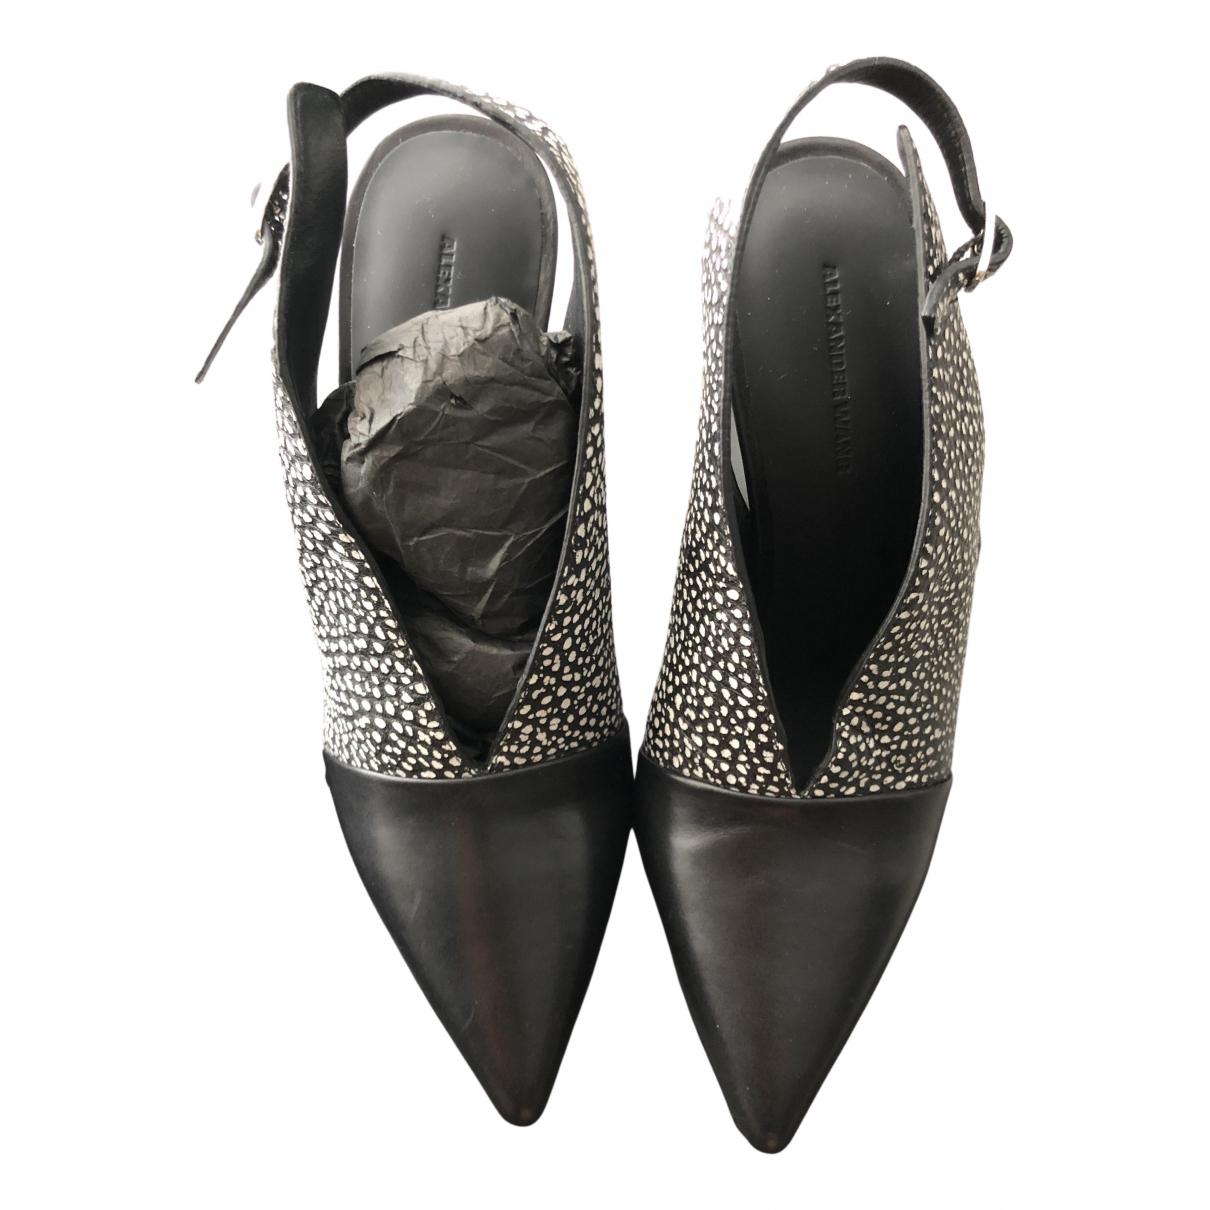 Alexander Wang N Black Leather Heels for Women 37 EU